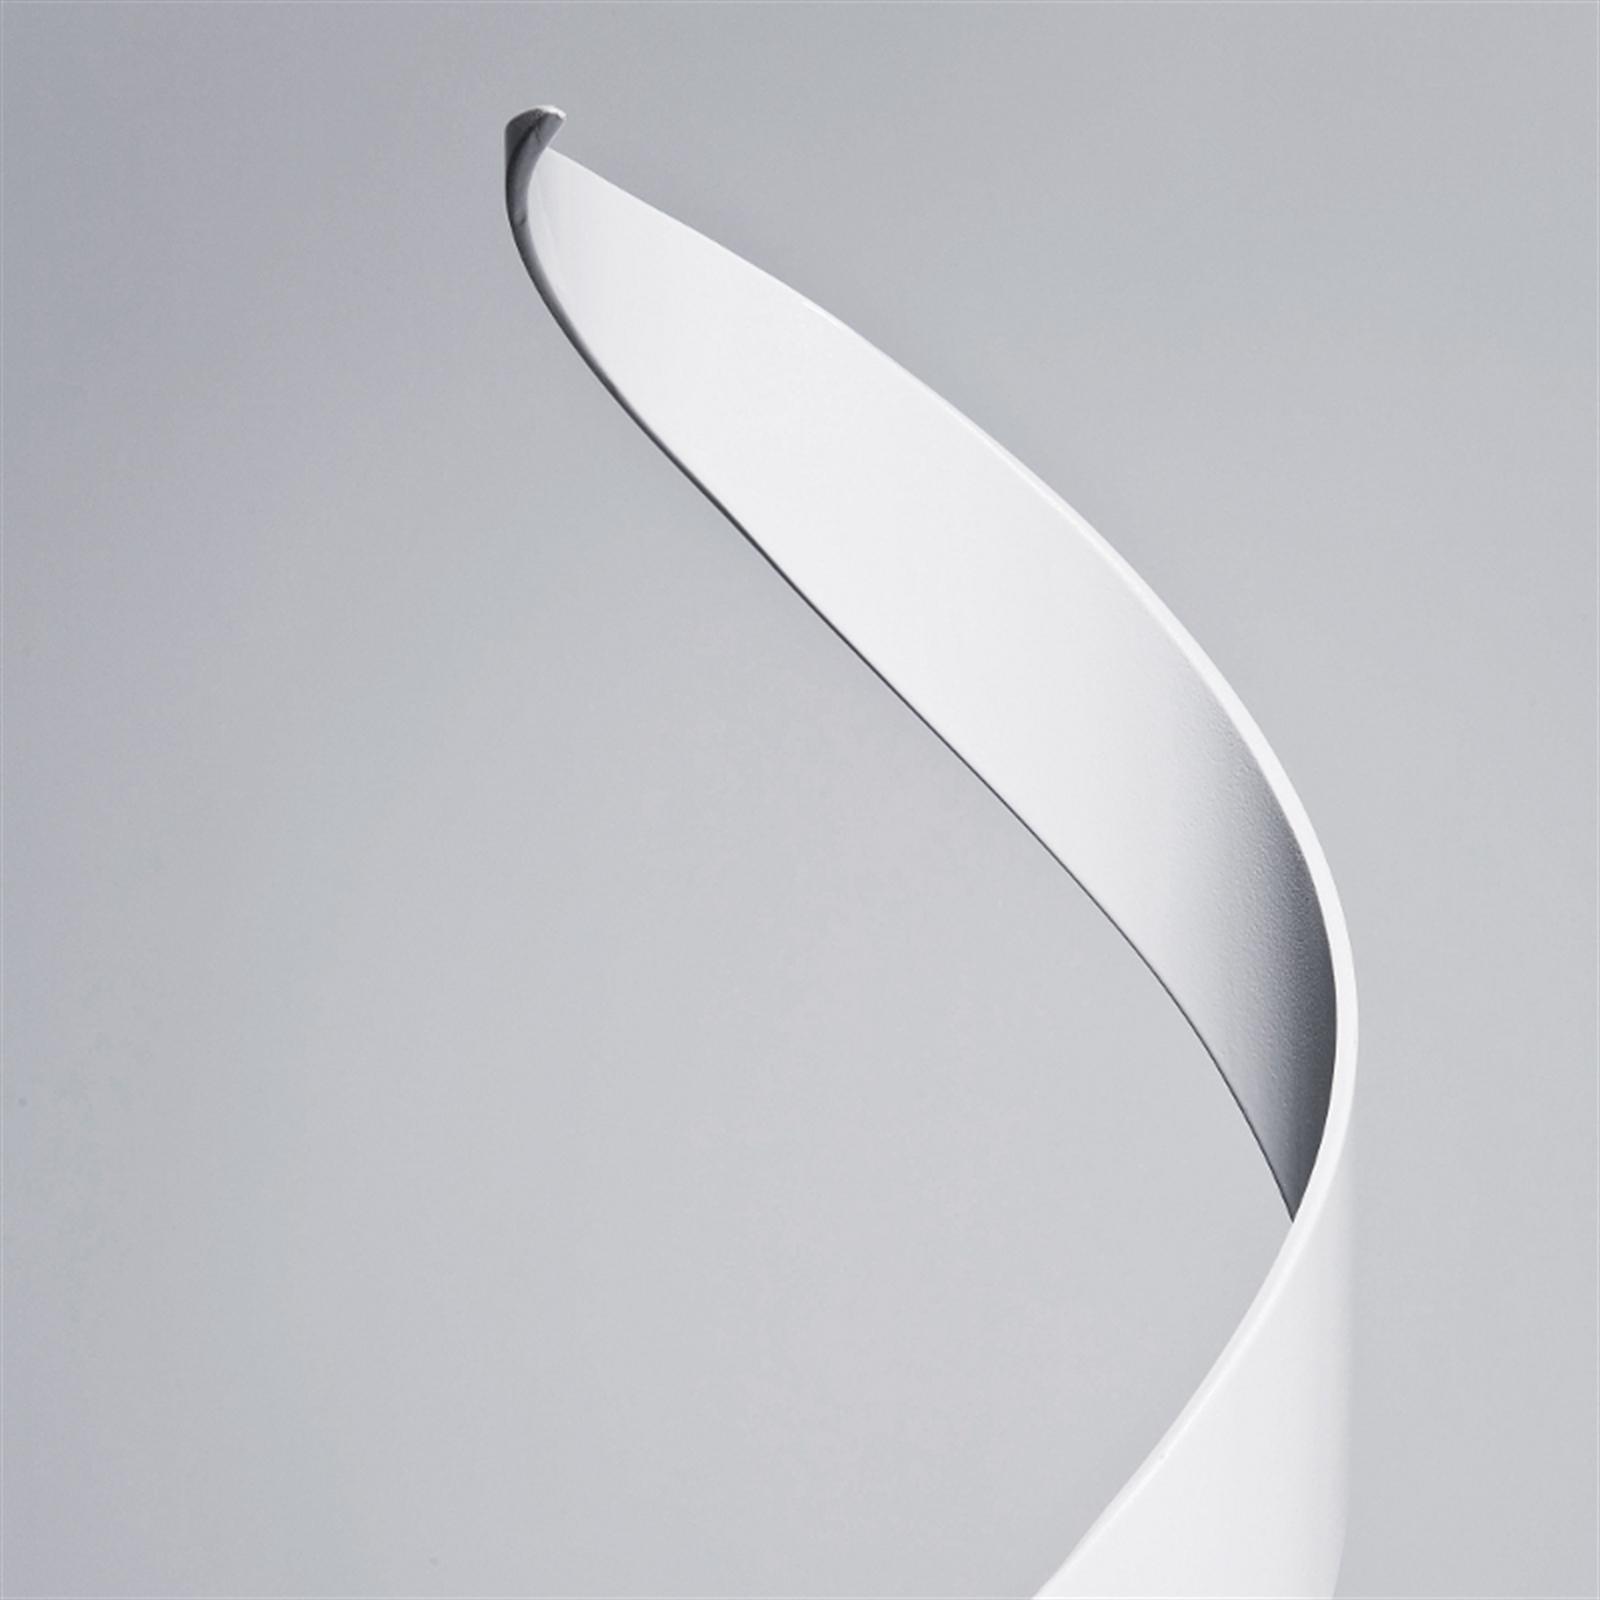 lounge design stehlampe helix stehleuchte lampe weiss ebay. Black Bedroom Furniture Sets. Home Design Ideas